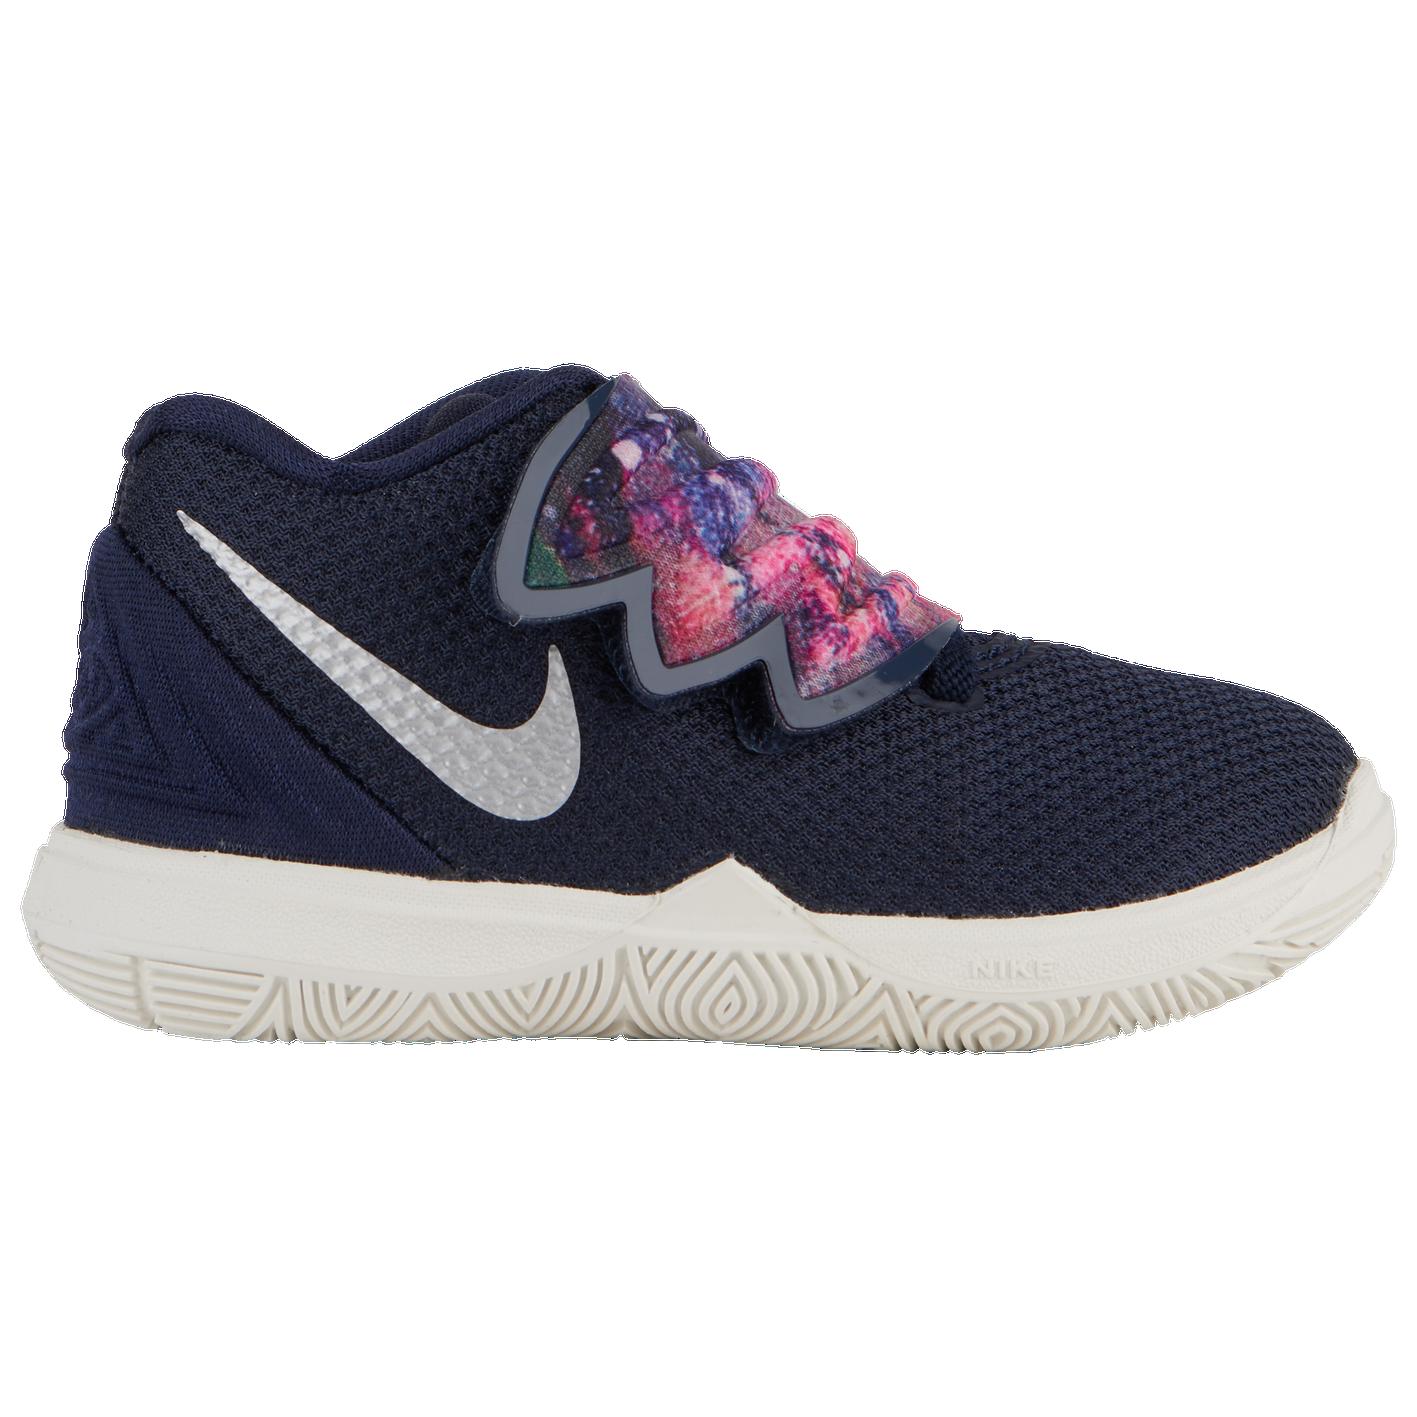 88102060bf4 Nike Kyrie 5 - Boys  Toddler - Basketball - Shoes - Irving